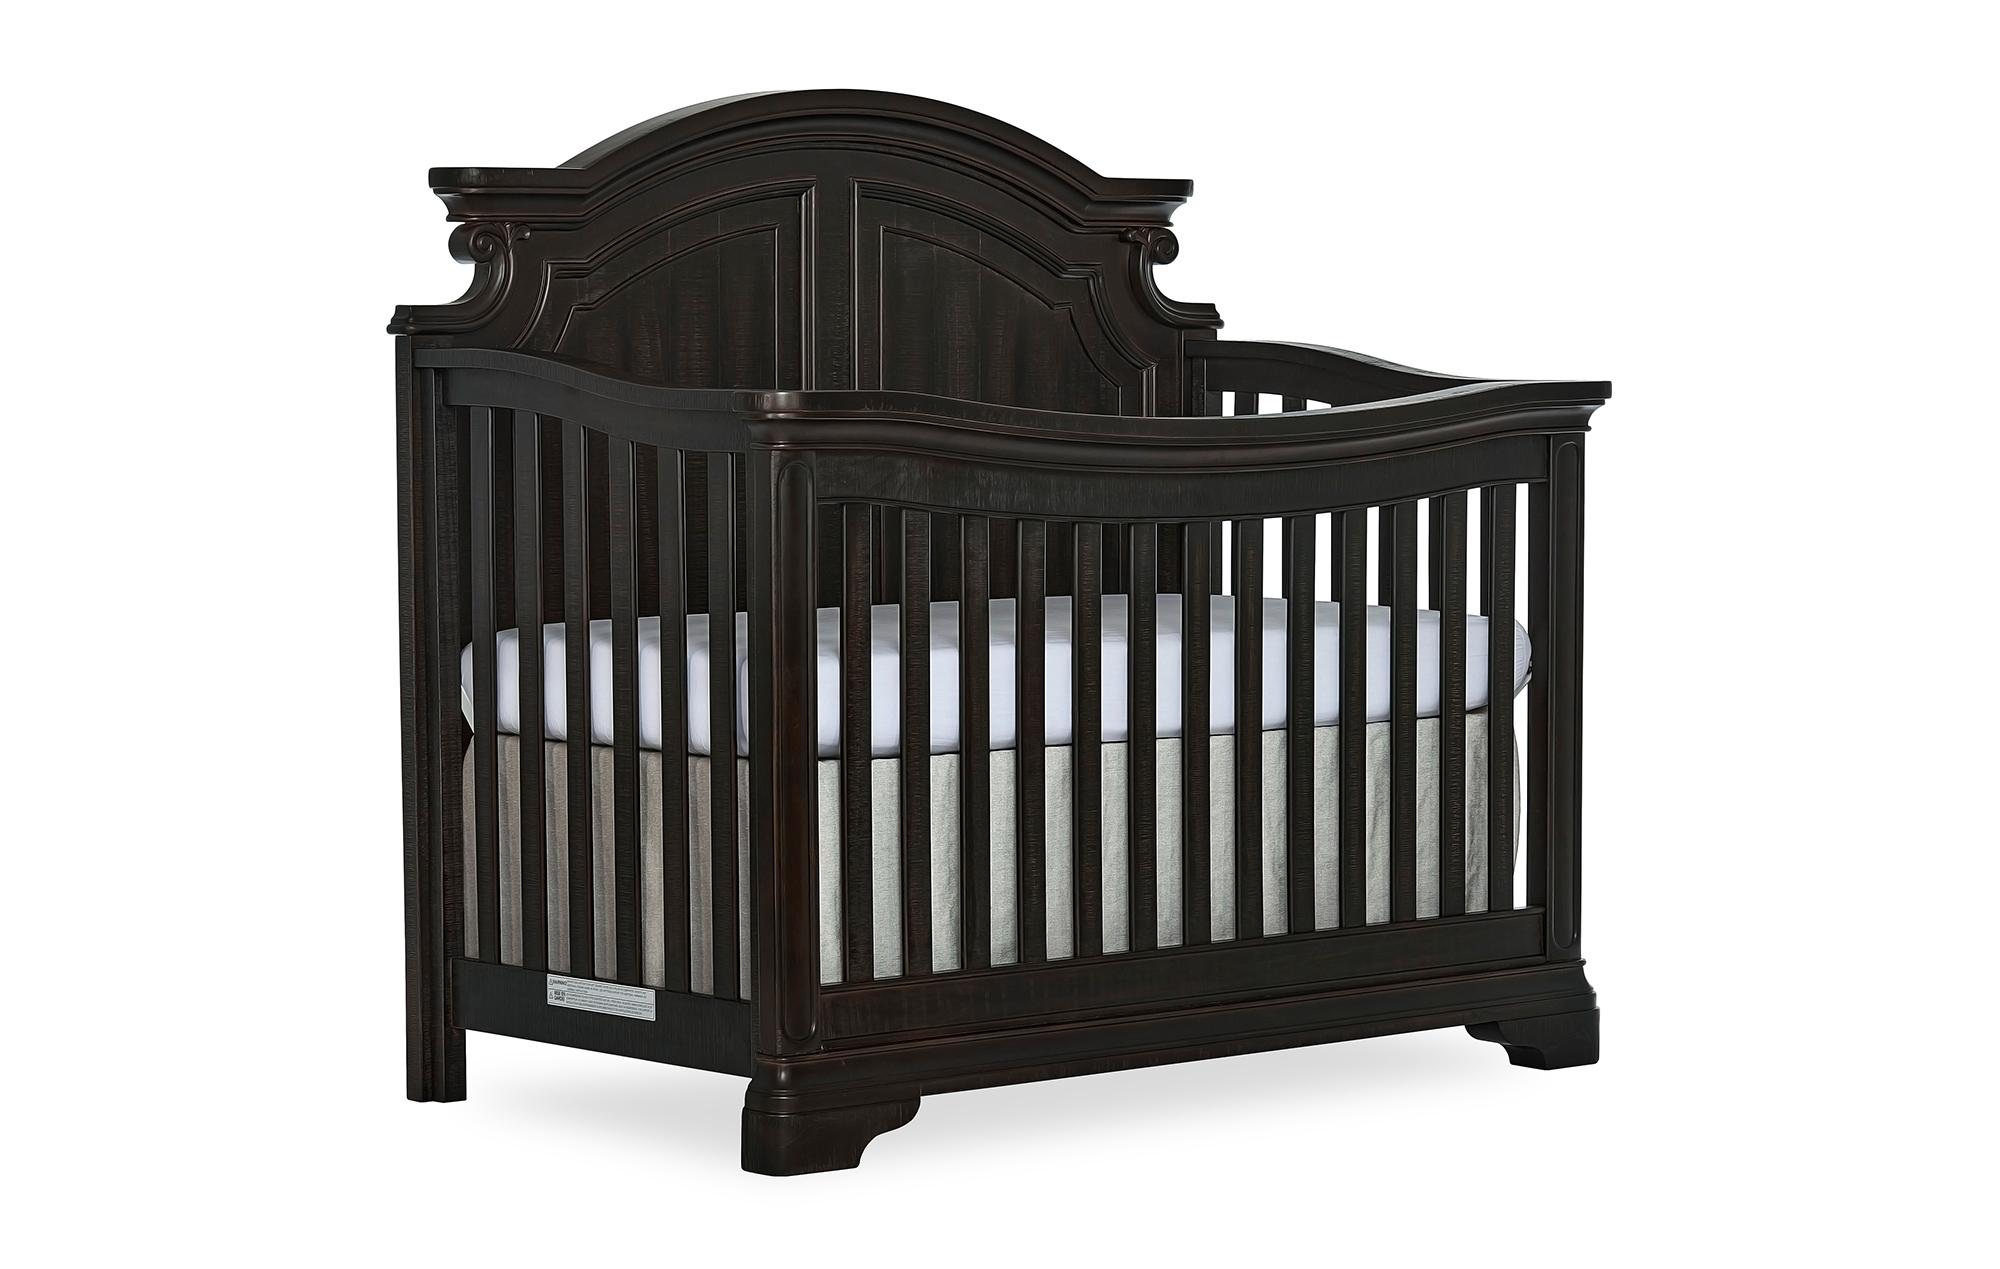 Evolur Belle 5-in-1 Convertible Crib